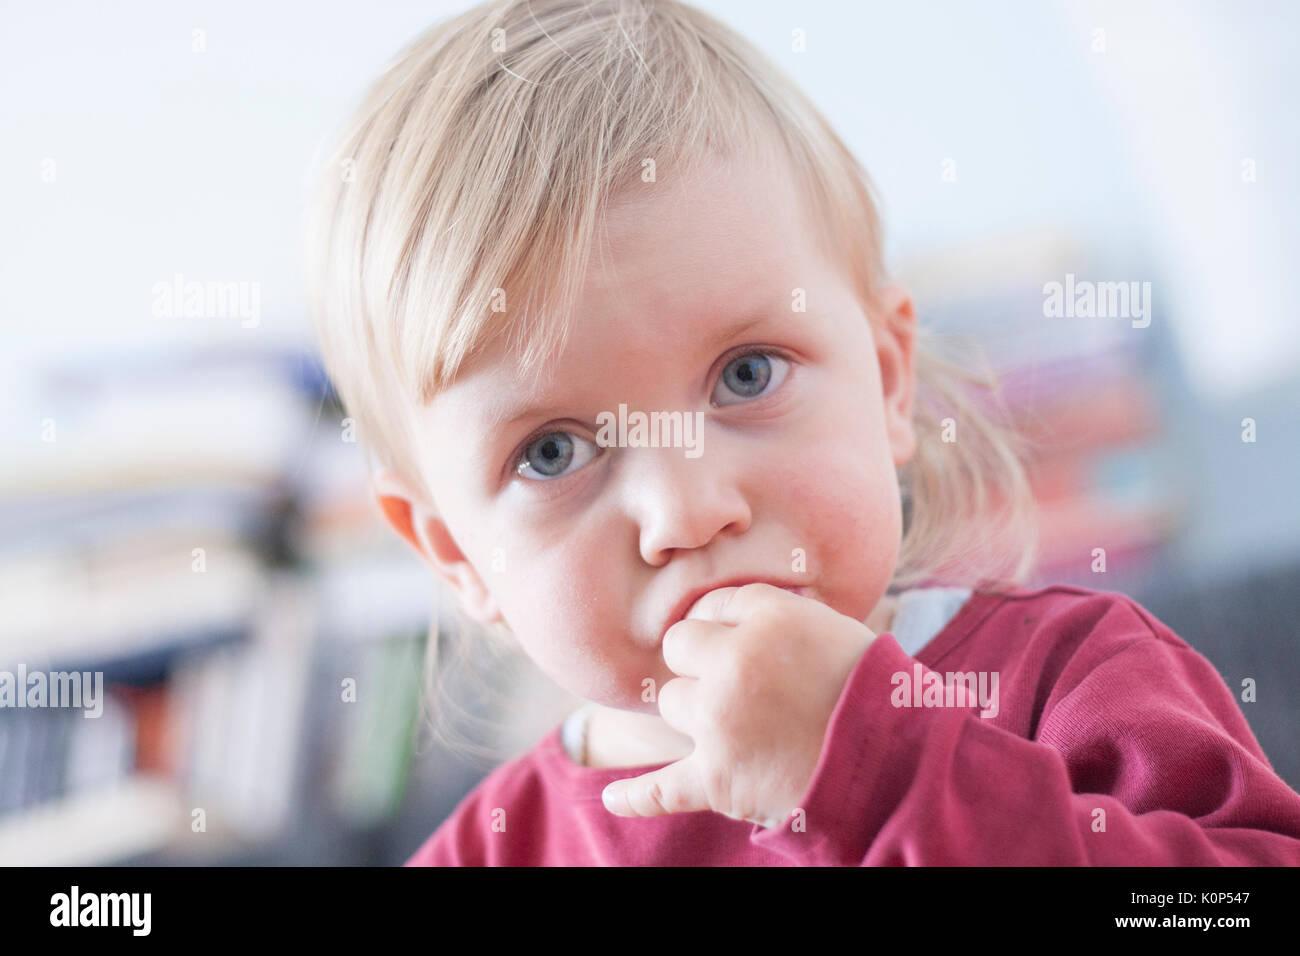 9a1f2837e Baby Red Hair Blue Eyes Stock Photos & Baby Red Hair Blue Eyes Stock ...